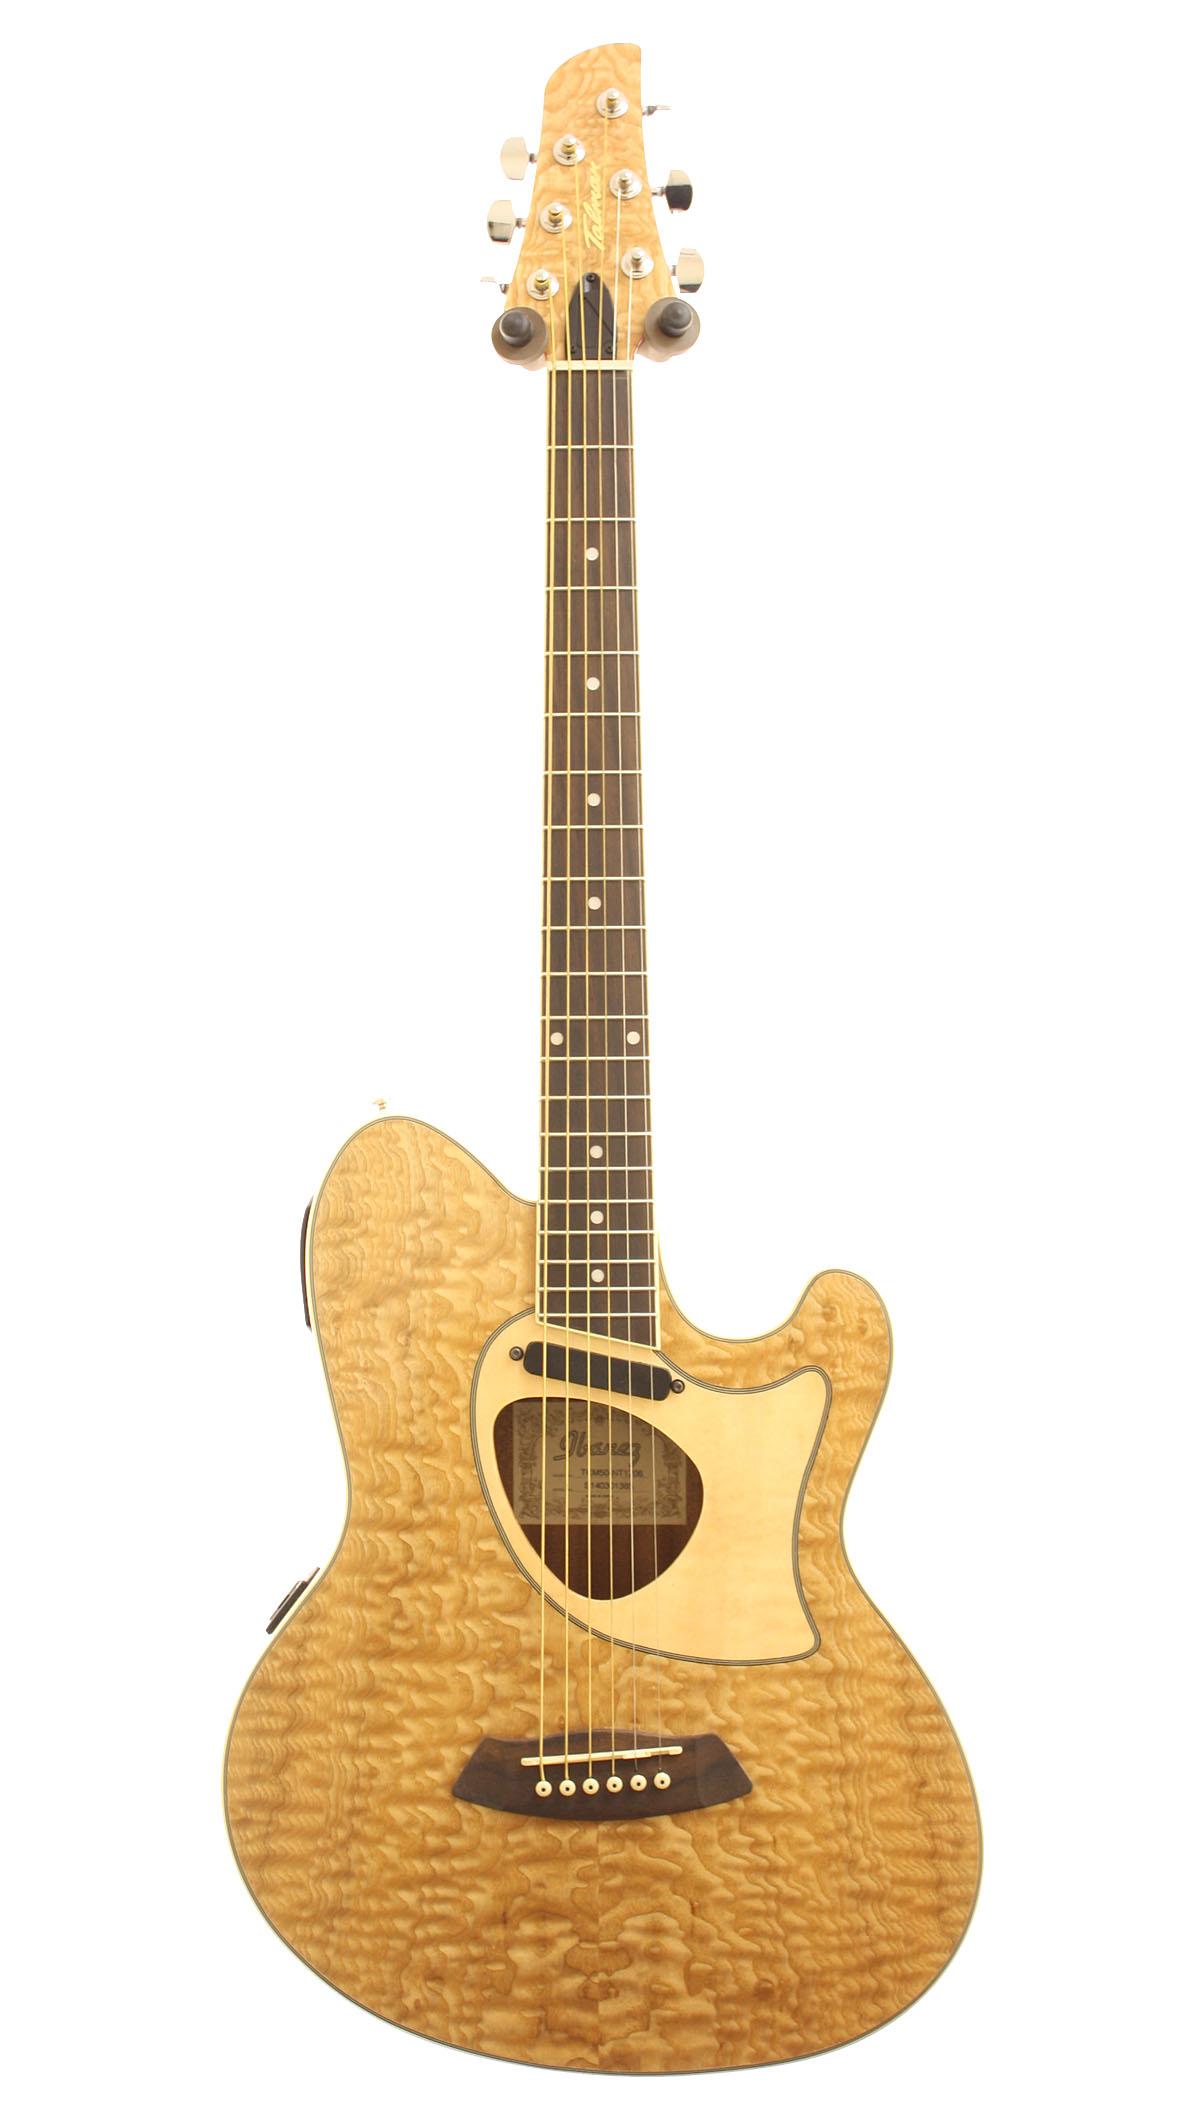 Ibanez Tcm50 Nt Talman Acoustic Guitars Amp Basses